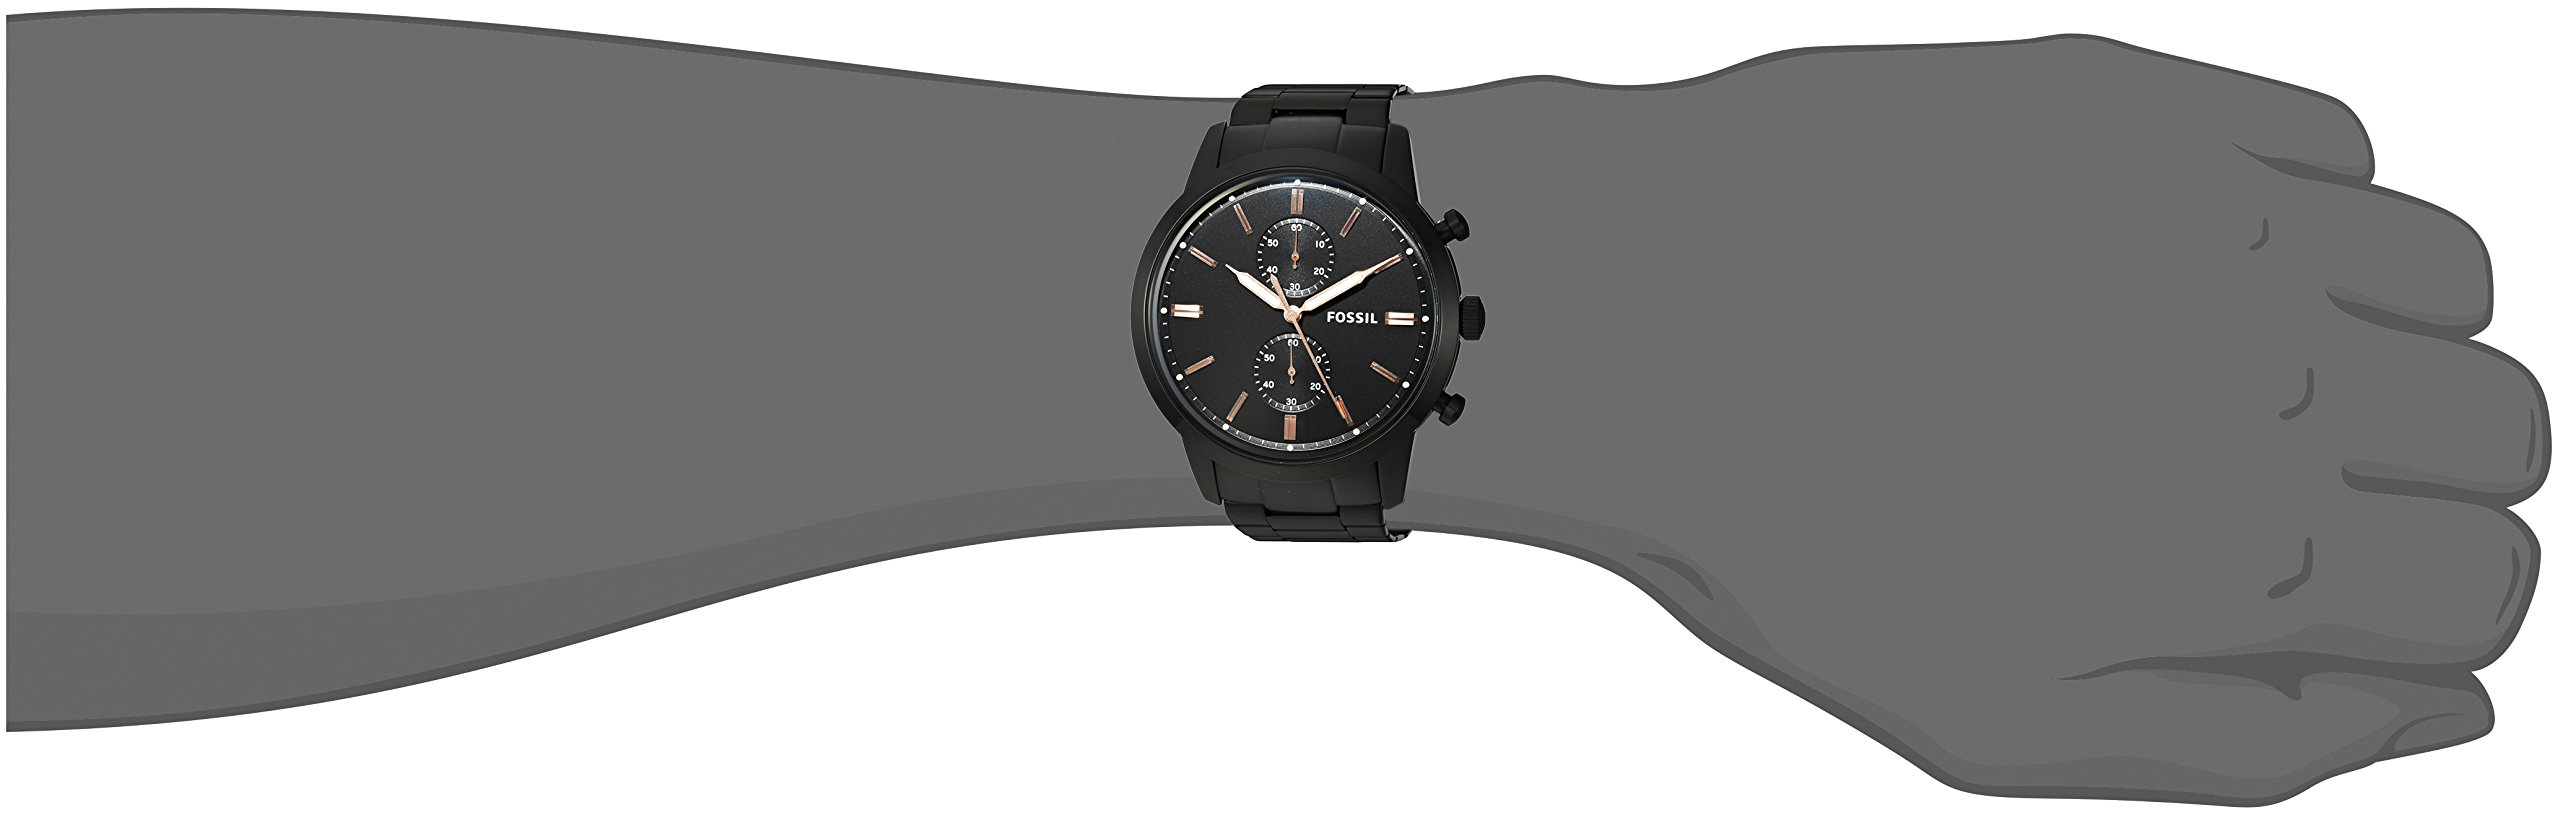 Fossil-Herren-Chronograph-Quarz-Uhr-mit-Edelstahl-Armband-FS5379